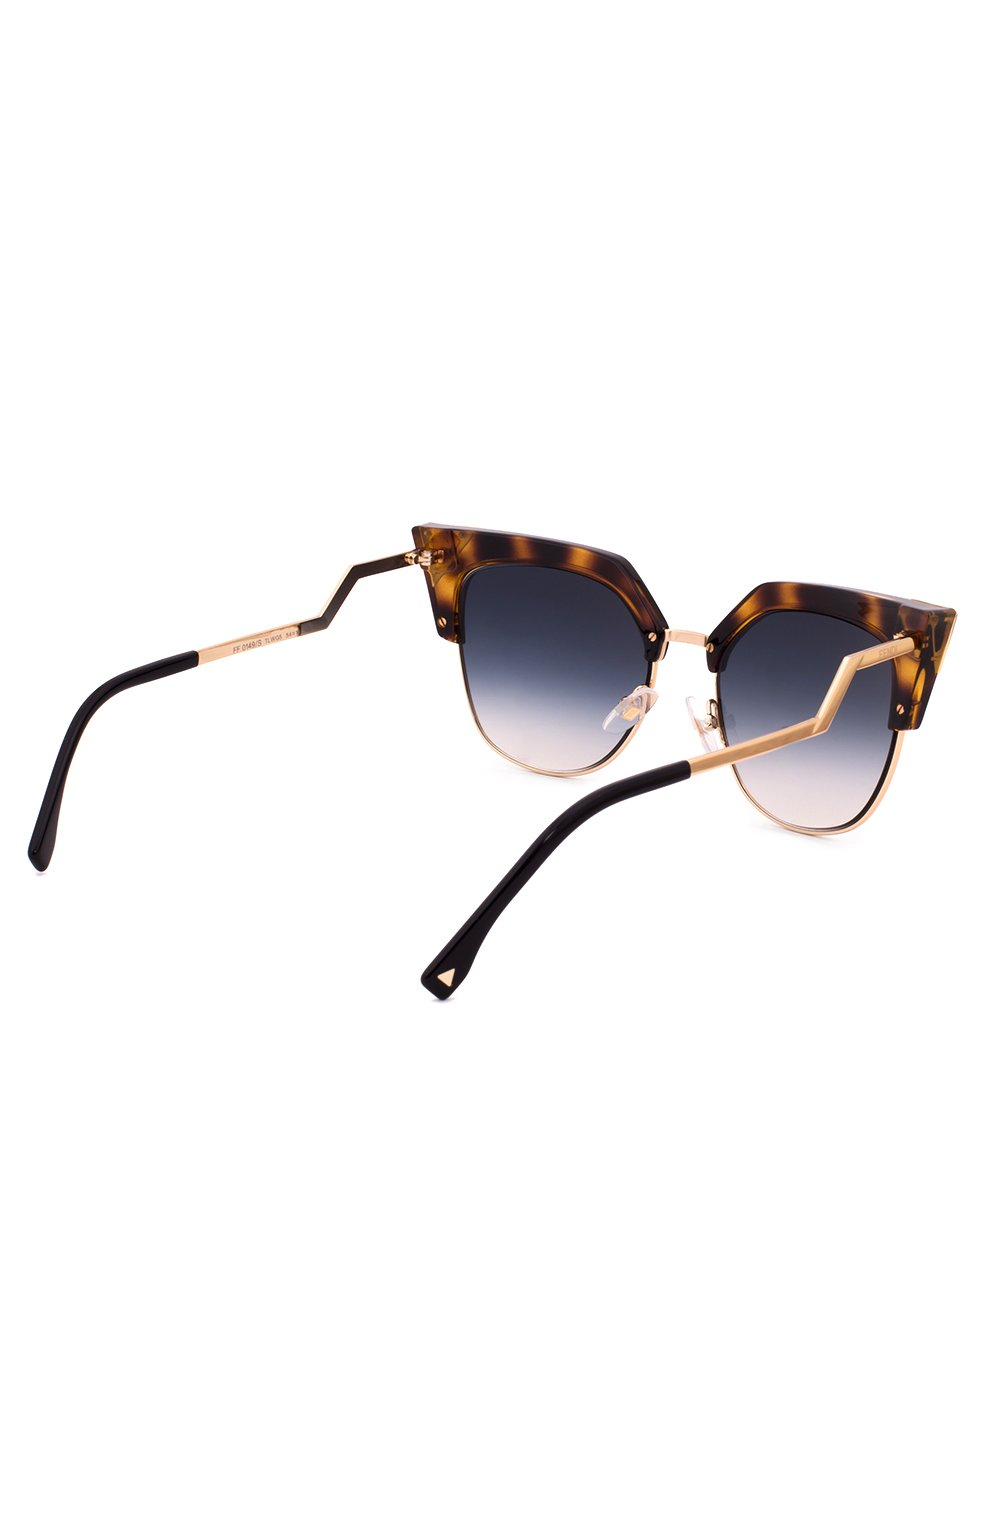 Женские солнцезащитные очки FENDI синего цвета, арт. 0149 TLW   Фото 3